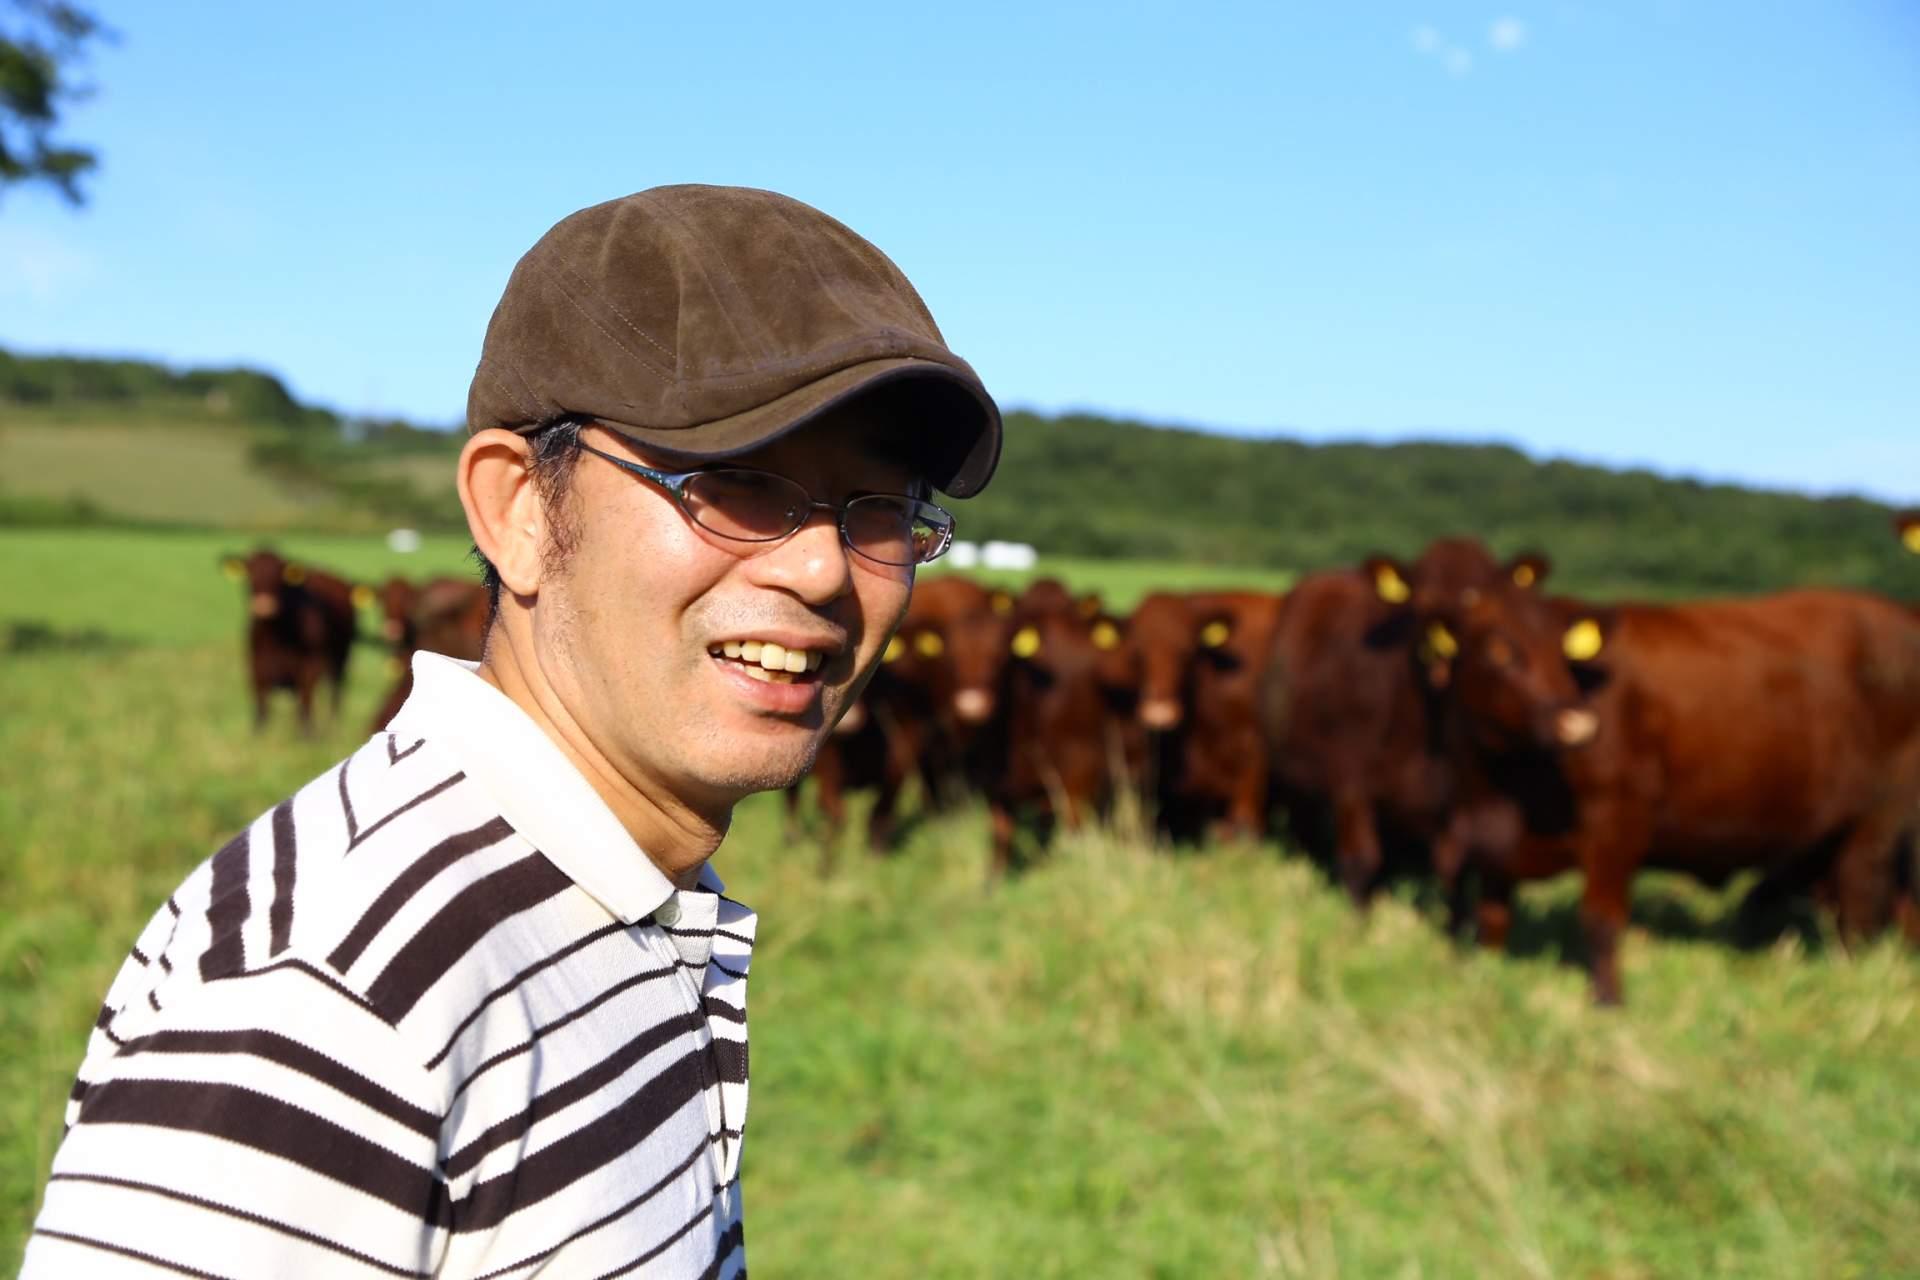 Yakumo Ranch - アペロ ワインバー / apéro WINEBAR - vins et petits plats français - Minami Aoyama Tokyo